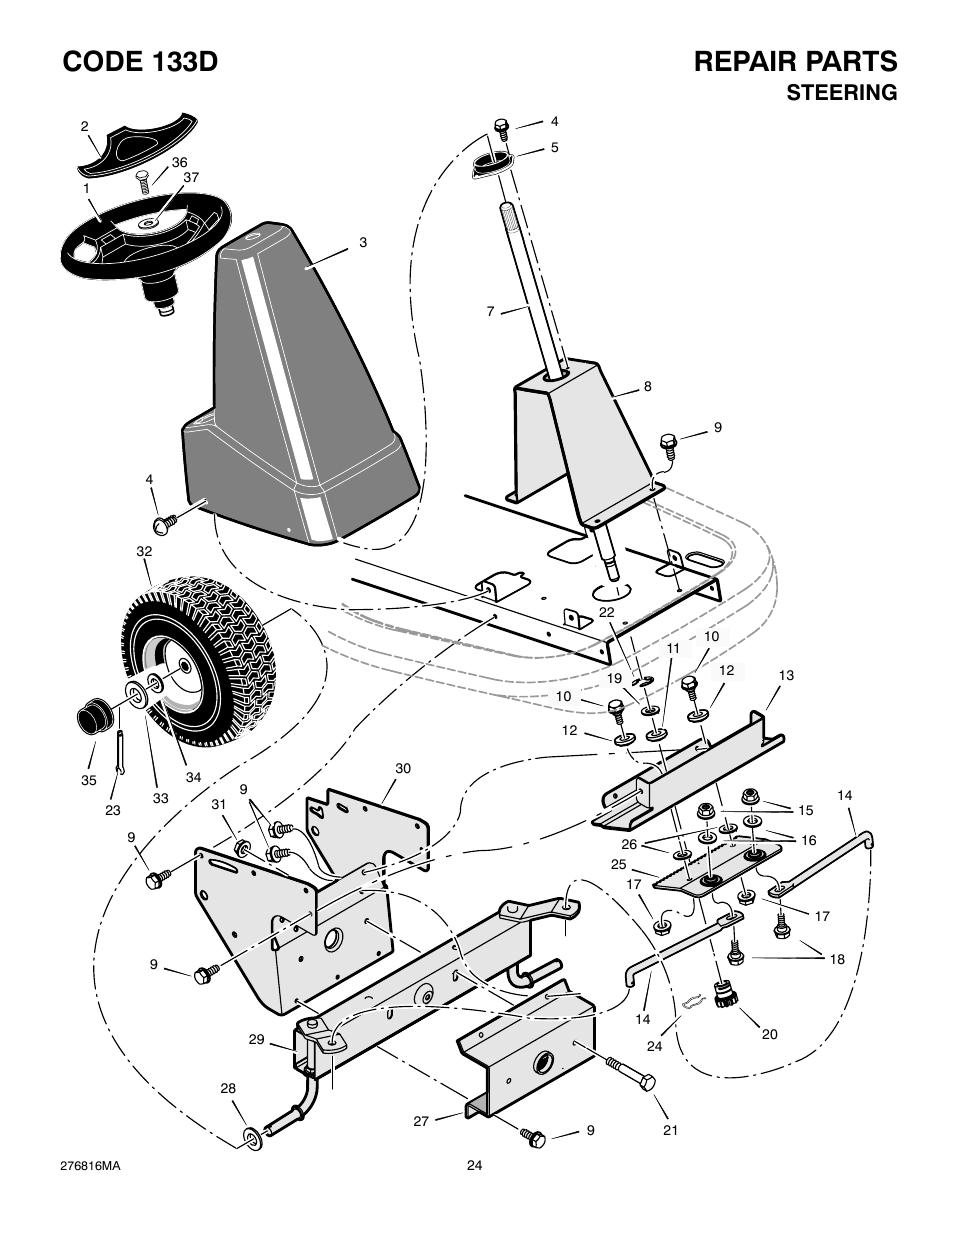 Repair Parts Code 133d  Steering